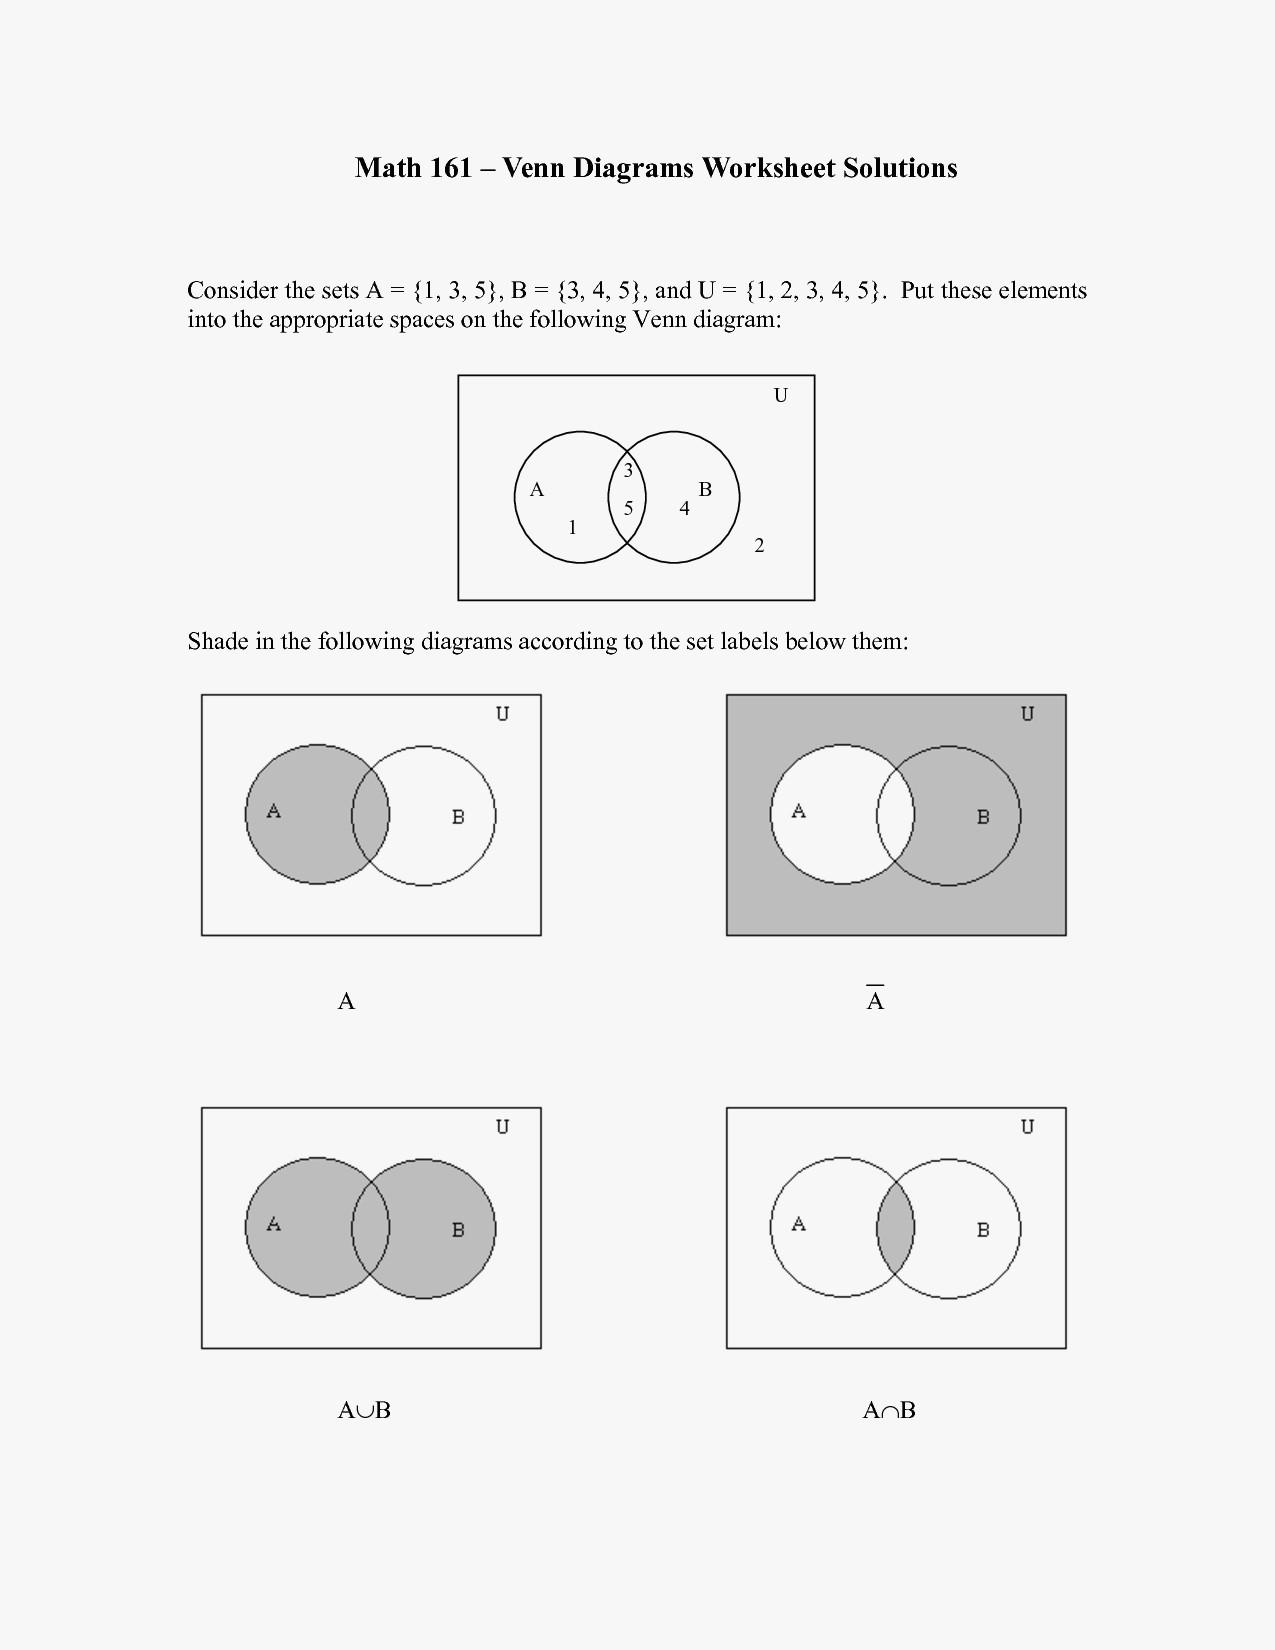 Venn Diagram Worksheet Basic Venn Diagrams Worksheets Elegant Math Sets Worksheets